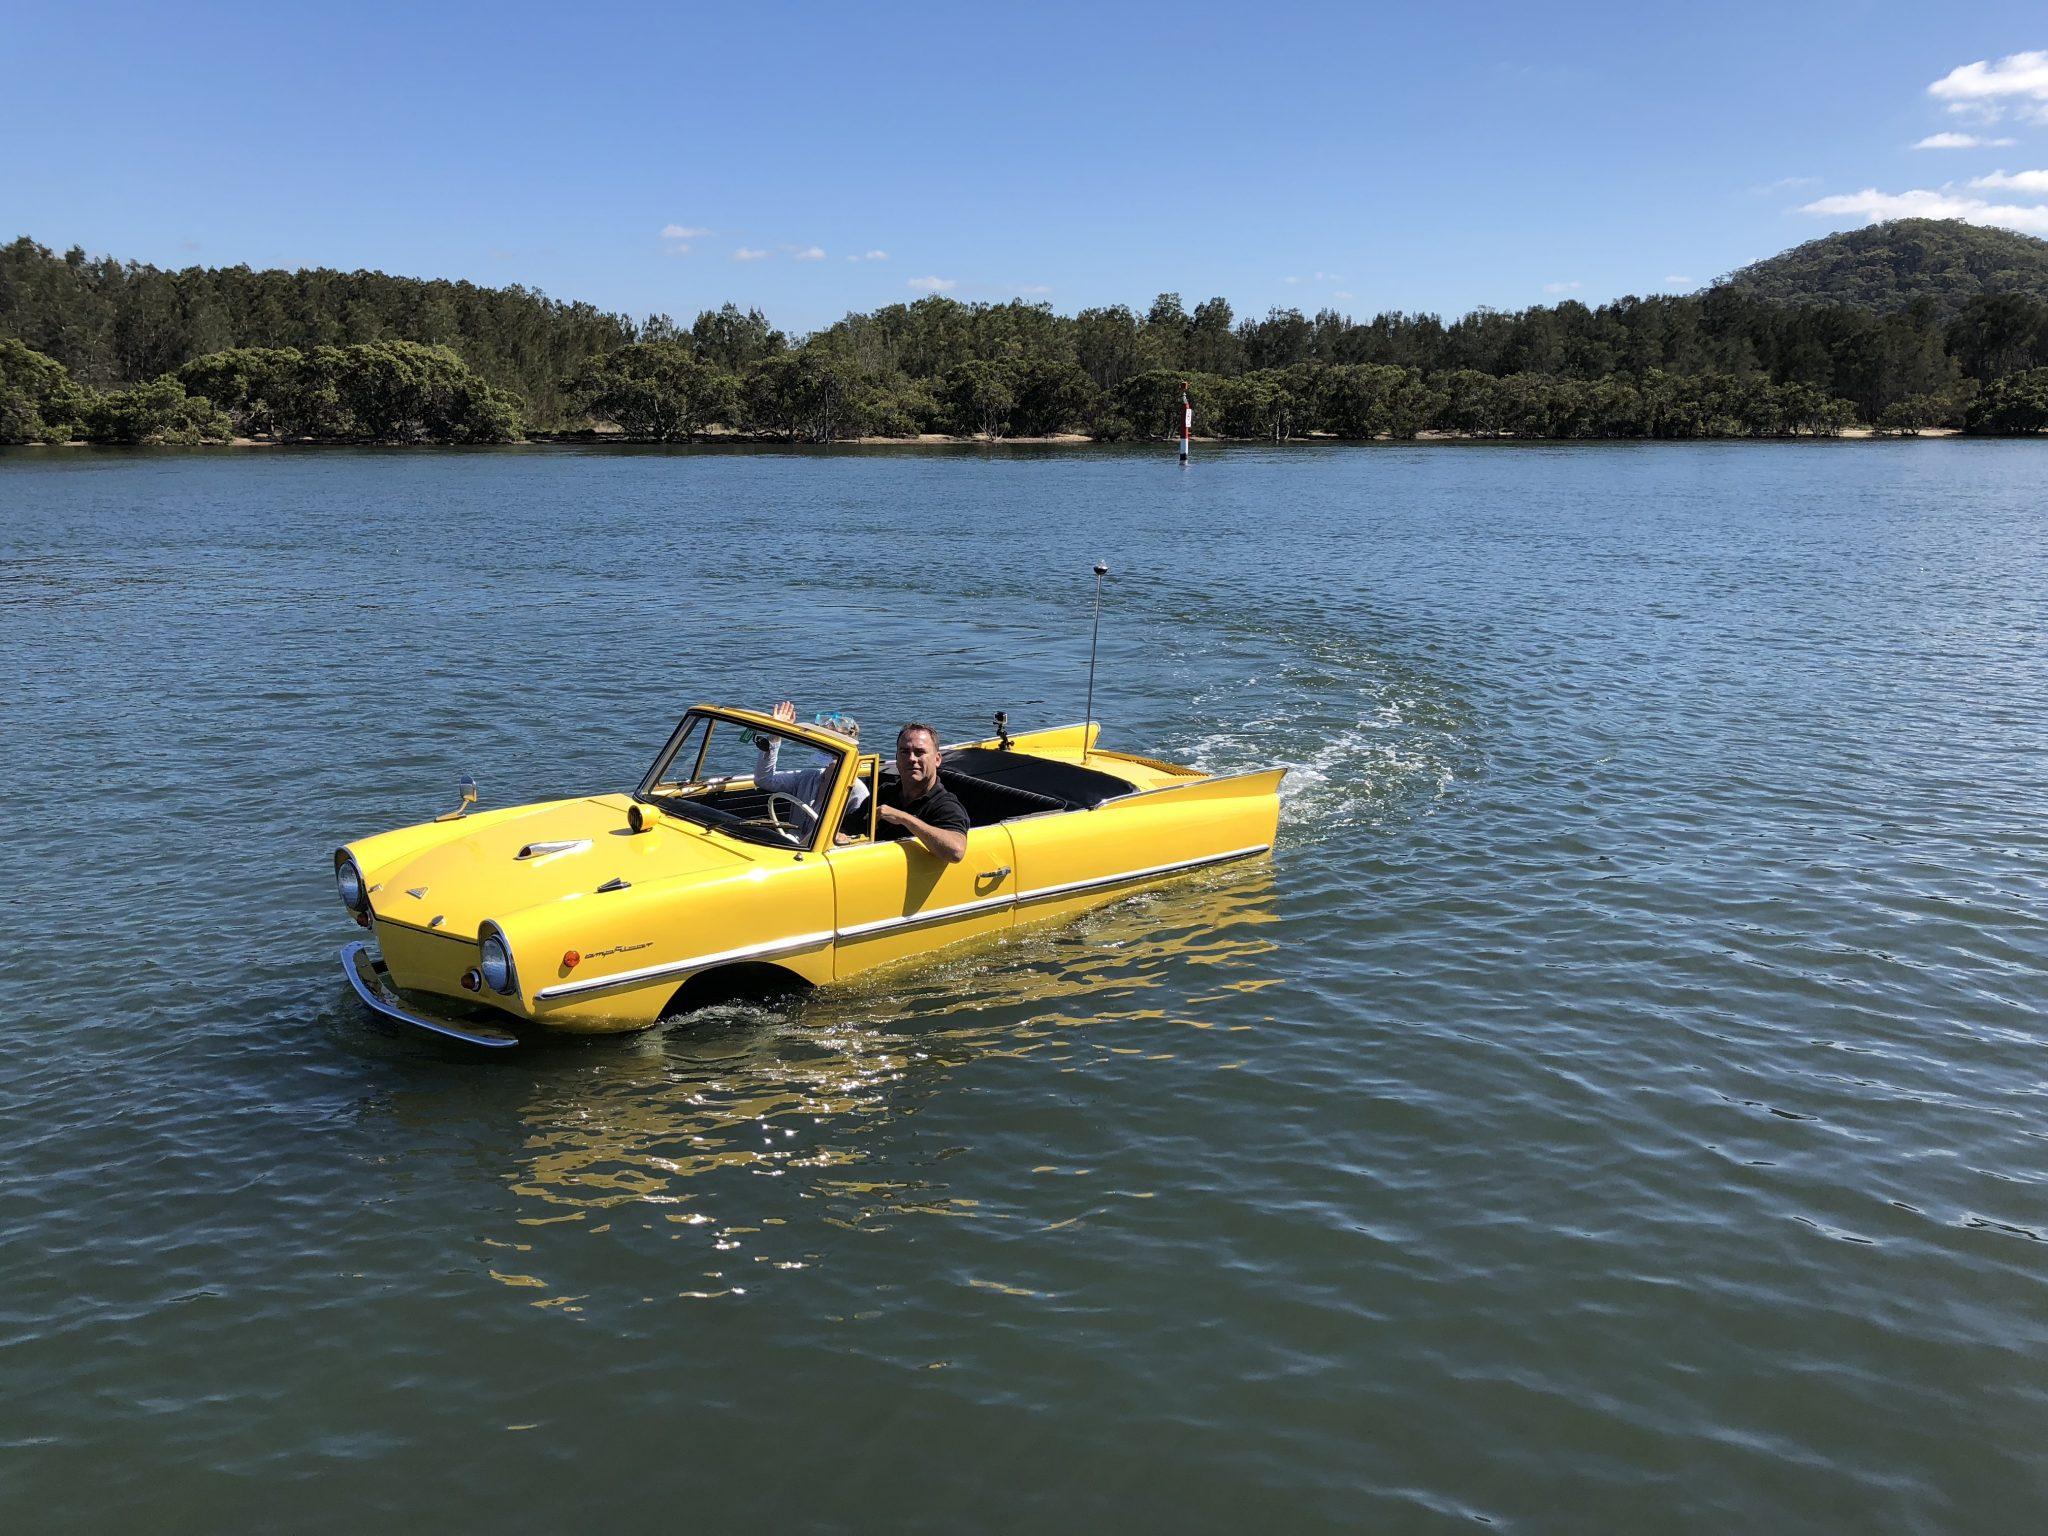 The Amphicar 770